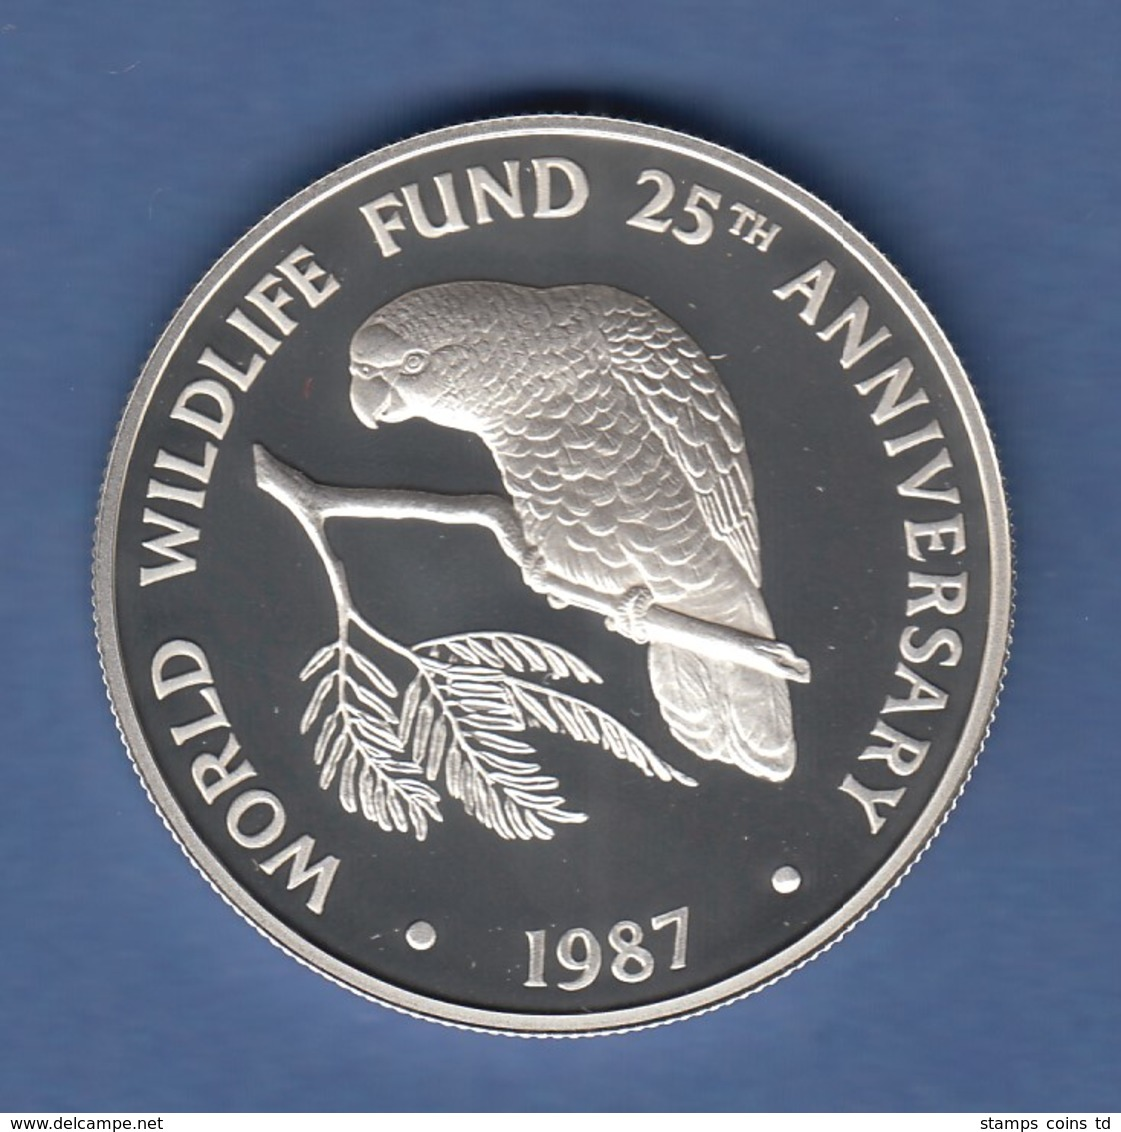 WWF Silber-Gedenkmünze Cayman Islands 1987, Amazonas-Papagei 5 $, 28g Ag925, PP  - Monete & Banconote